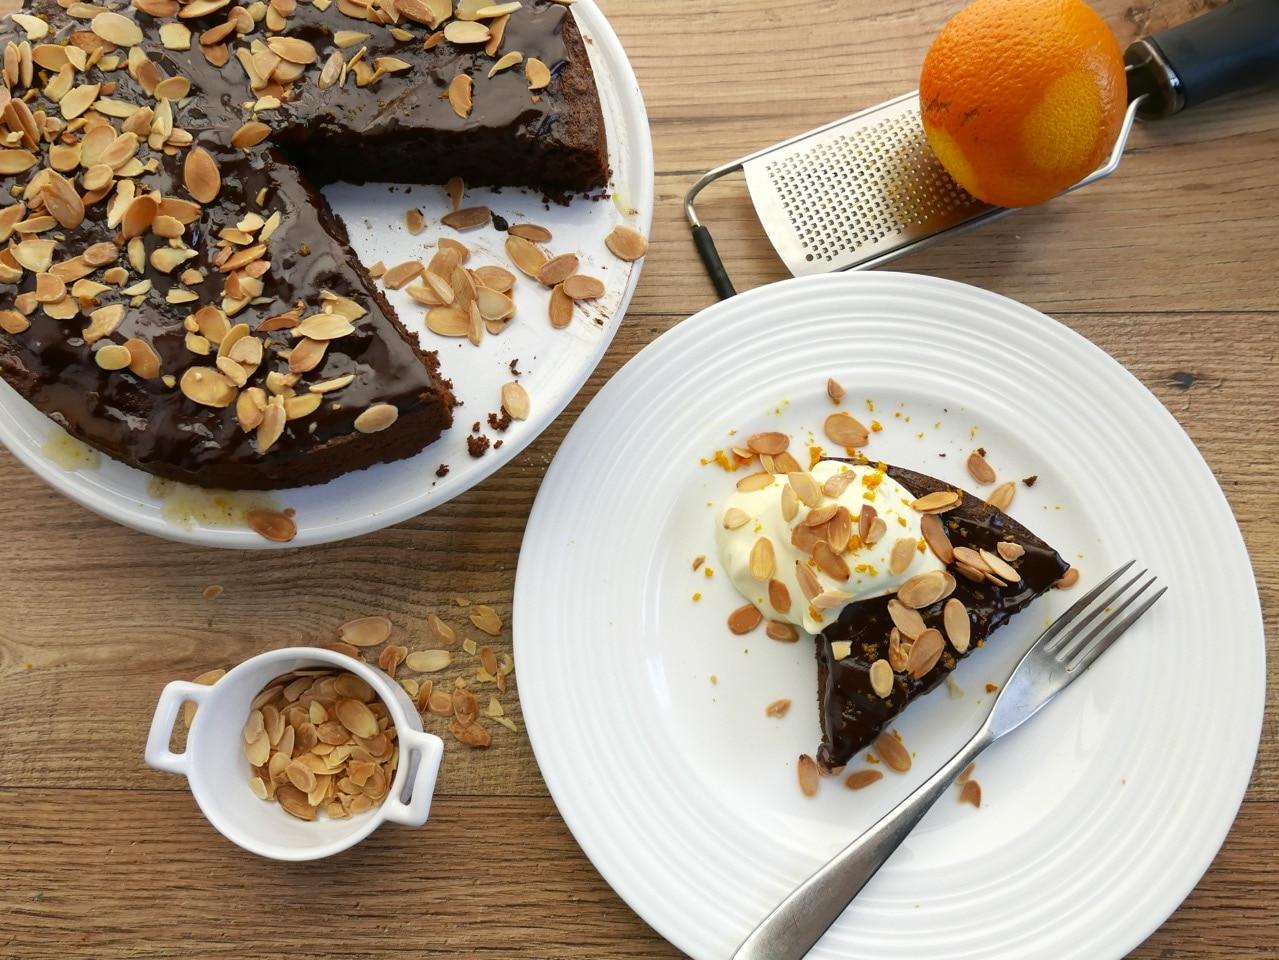 Chocolate and Marmalade Cake